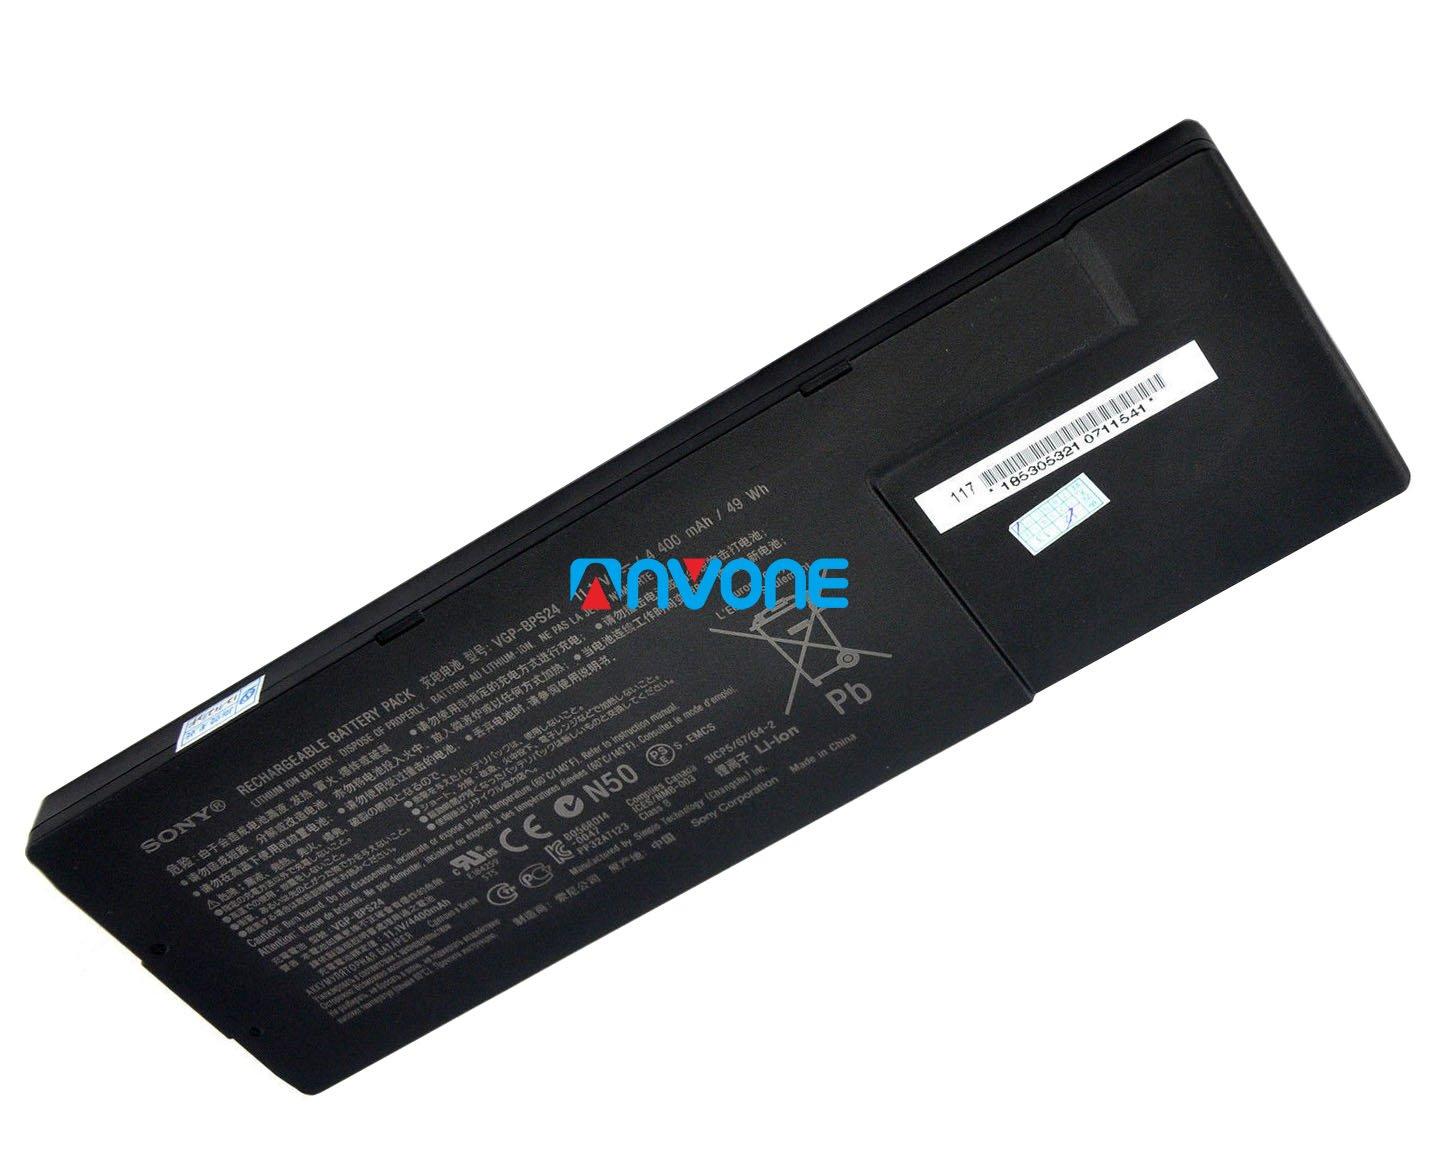 Genuine VGP-BPS24 Sony VAIO VPC-SB1AGJ VPC-SB1AGJA VPC-SB1AGX/B VPC-SB1AHJ Battery